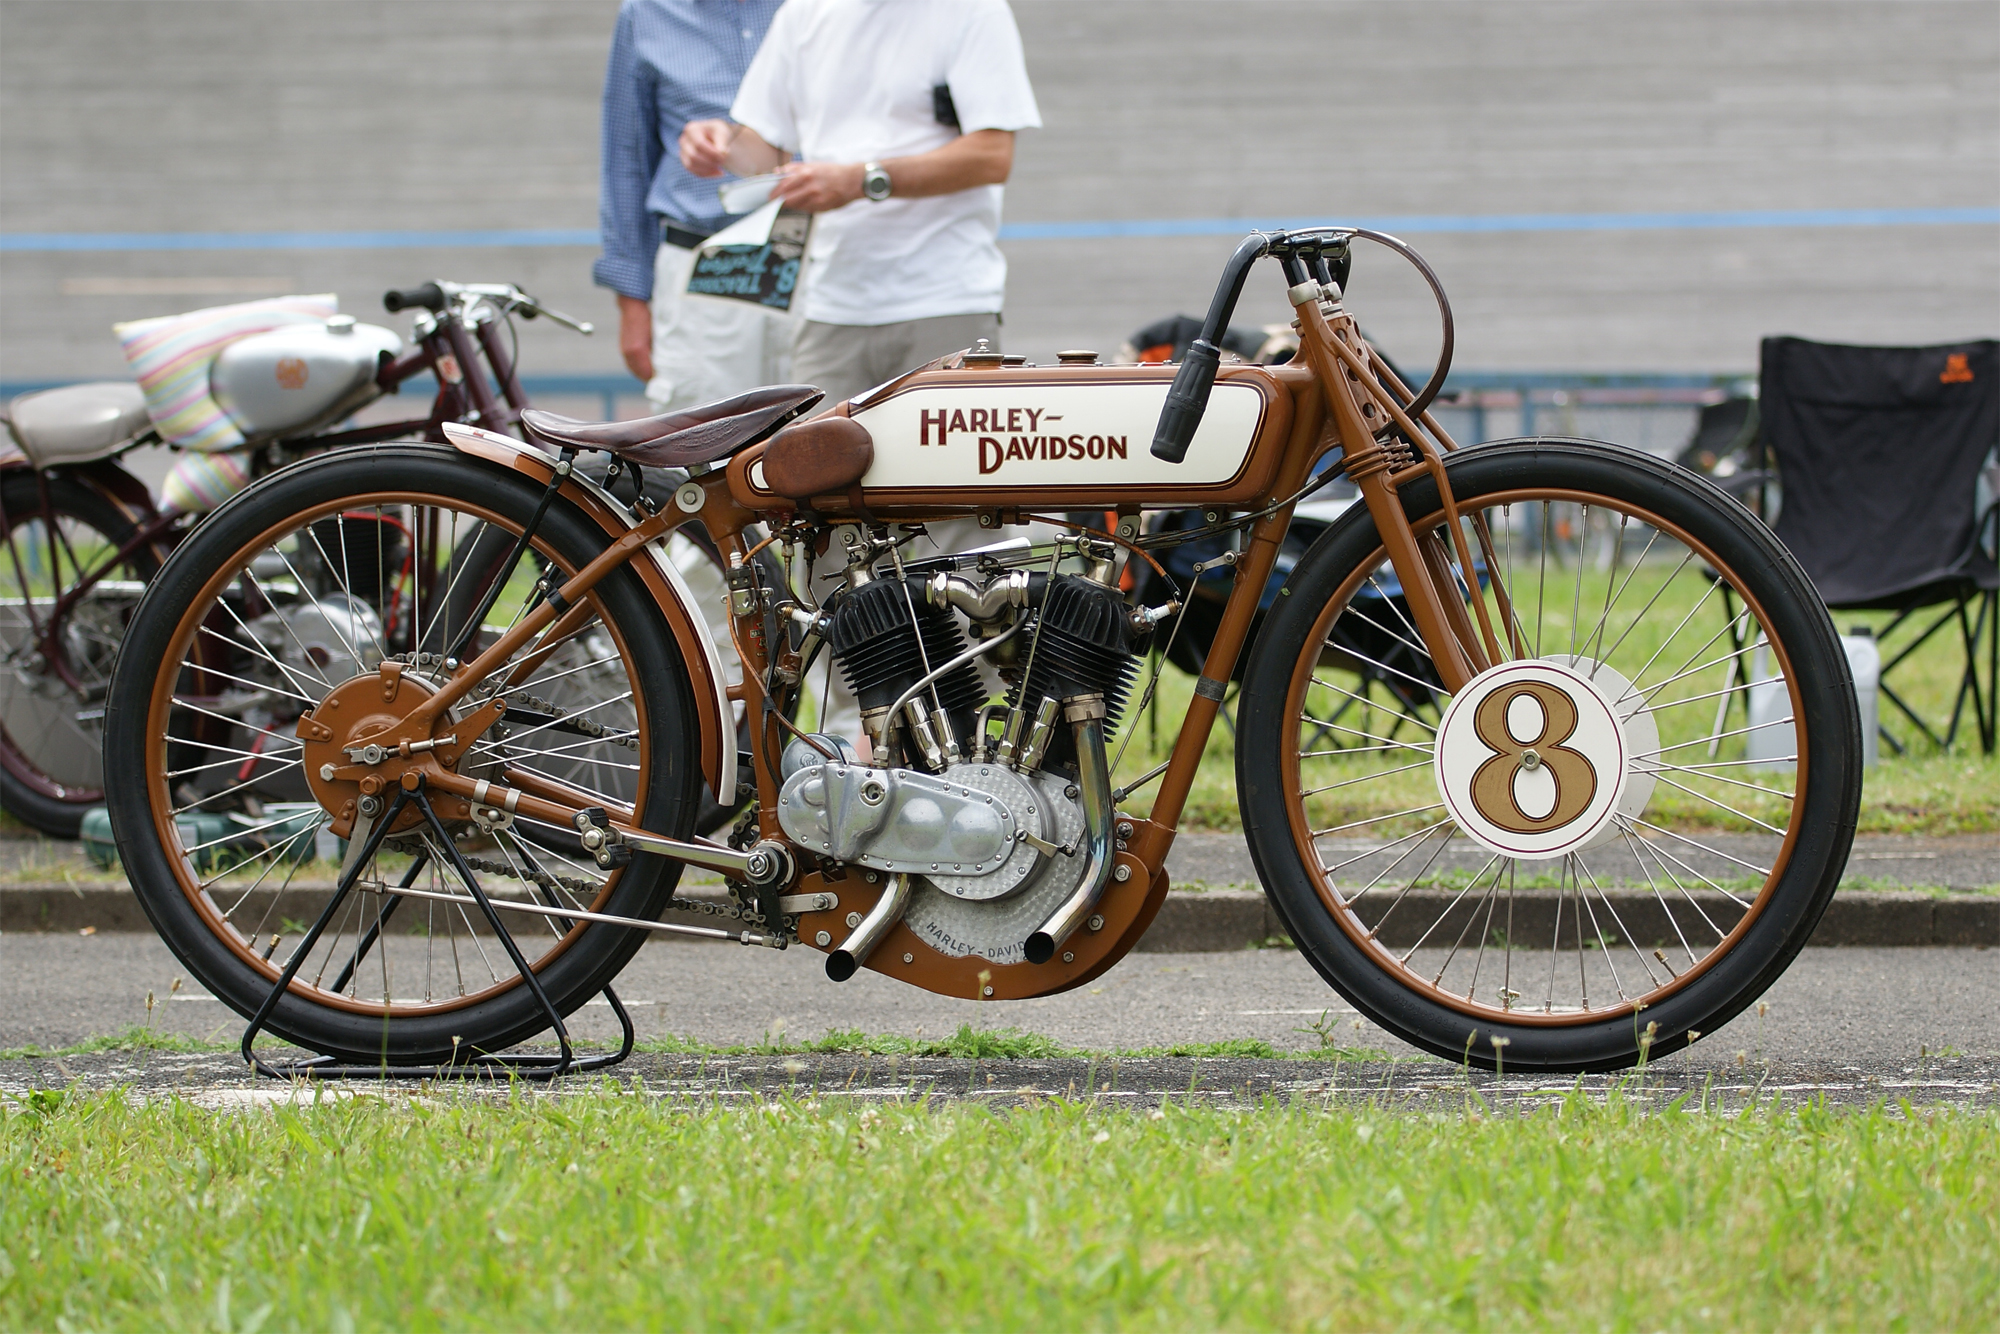 Harley Davidson Board Track Racer 1000cc 1920 ( De ) Michael Kretschmer